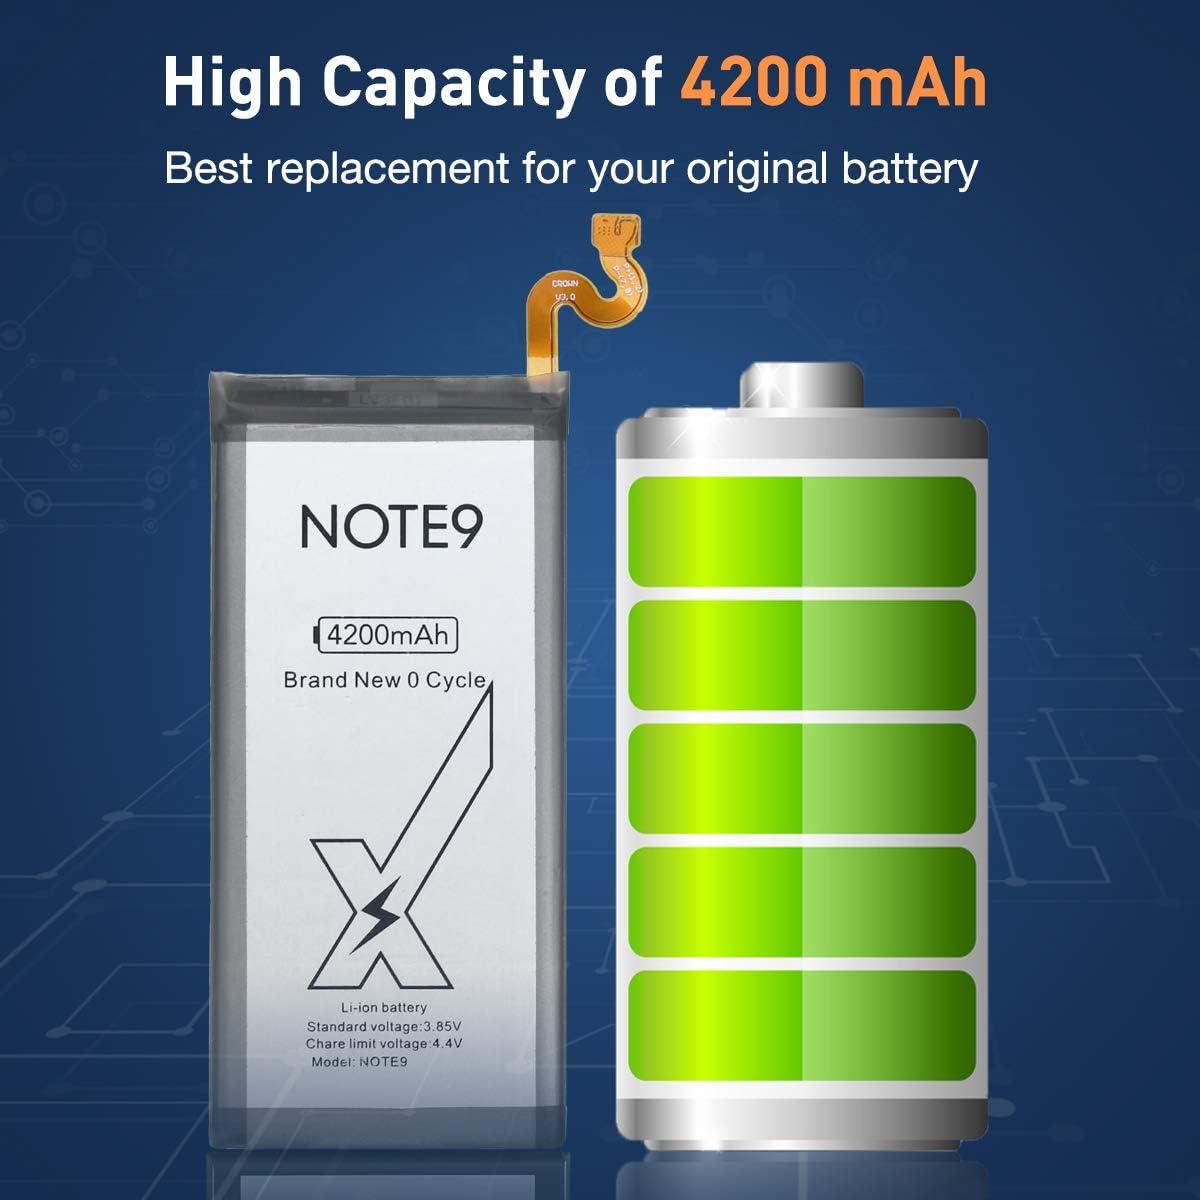 N9000 DEJIMAX Batterie pour Samsung Galaxy Note 3,3400mAh Note 3 Batterie High Capital avec NFC pour NOTE3 N9005 N9002 N900 N900A